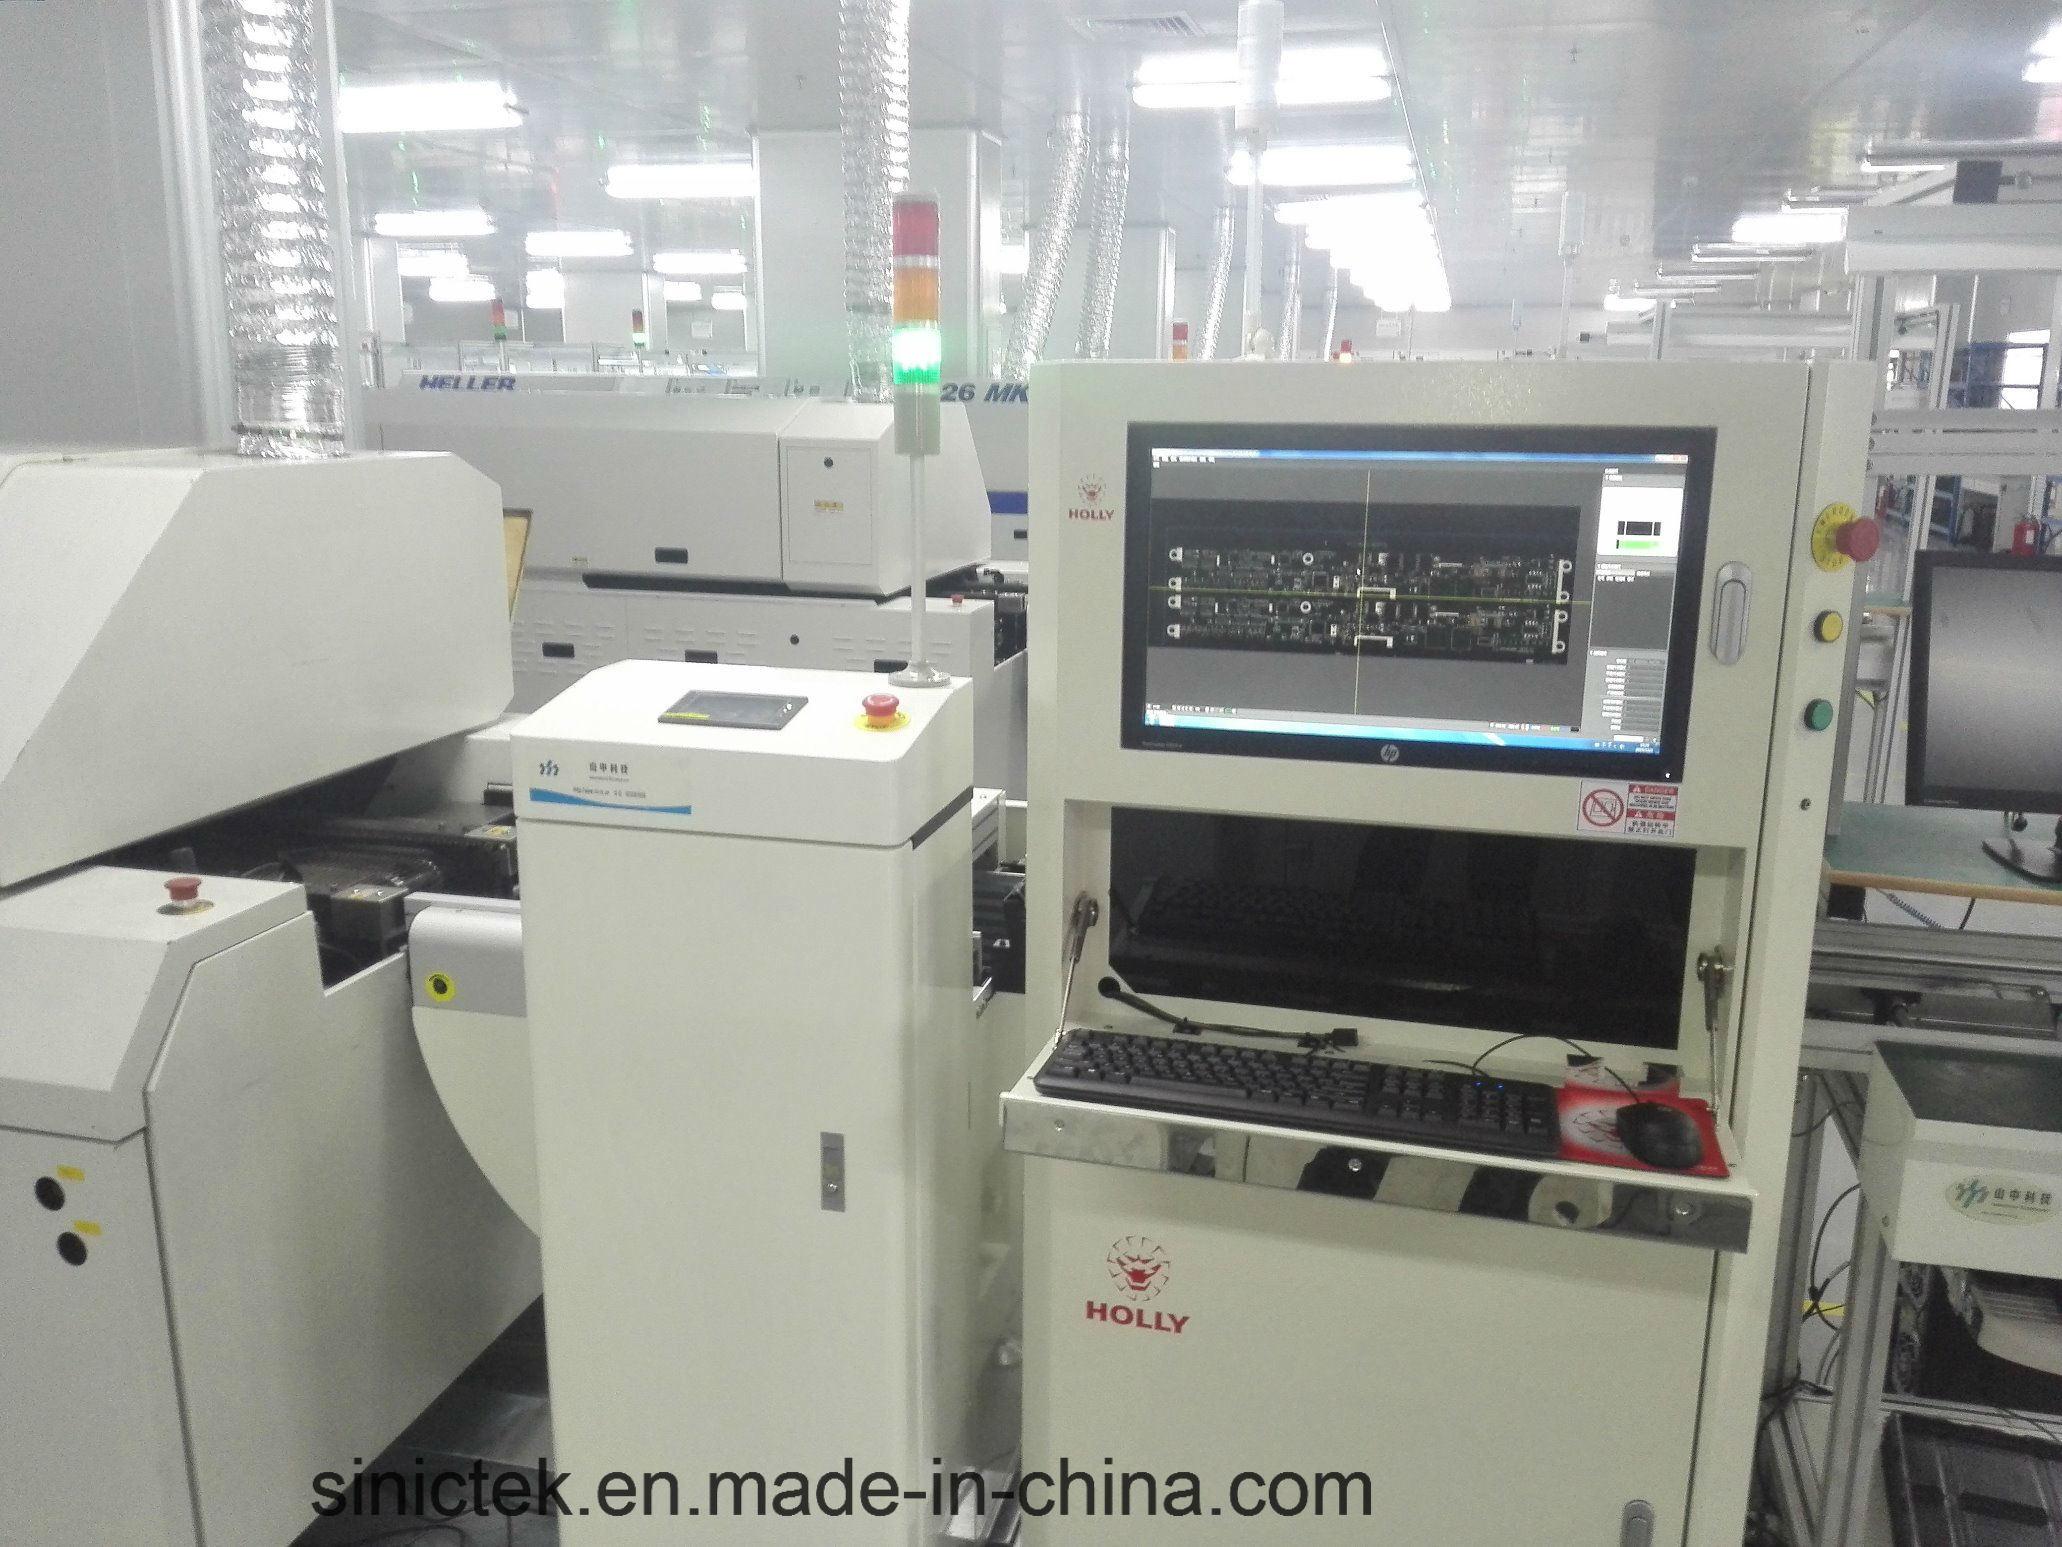 Automatic Optic Inspection Machine/Aoi Machine for PCB Testing on PCBA